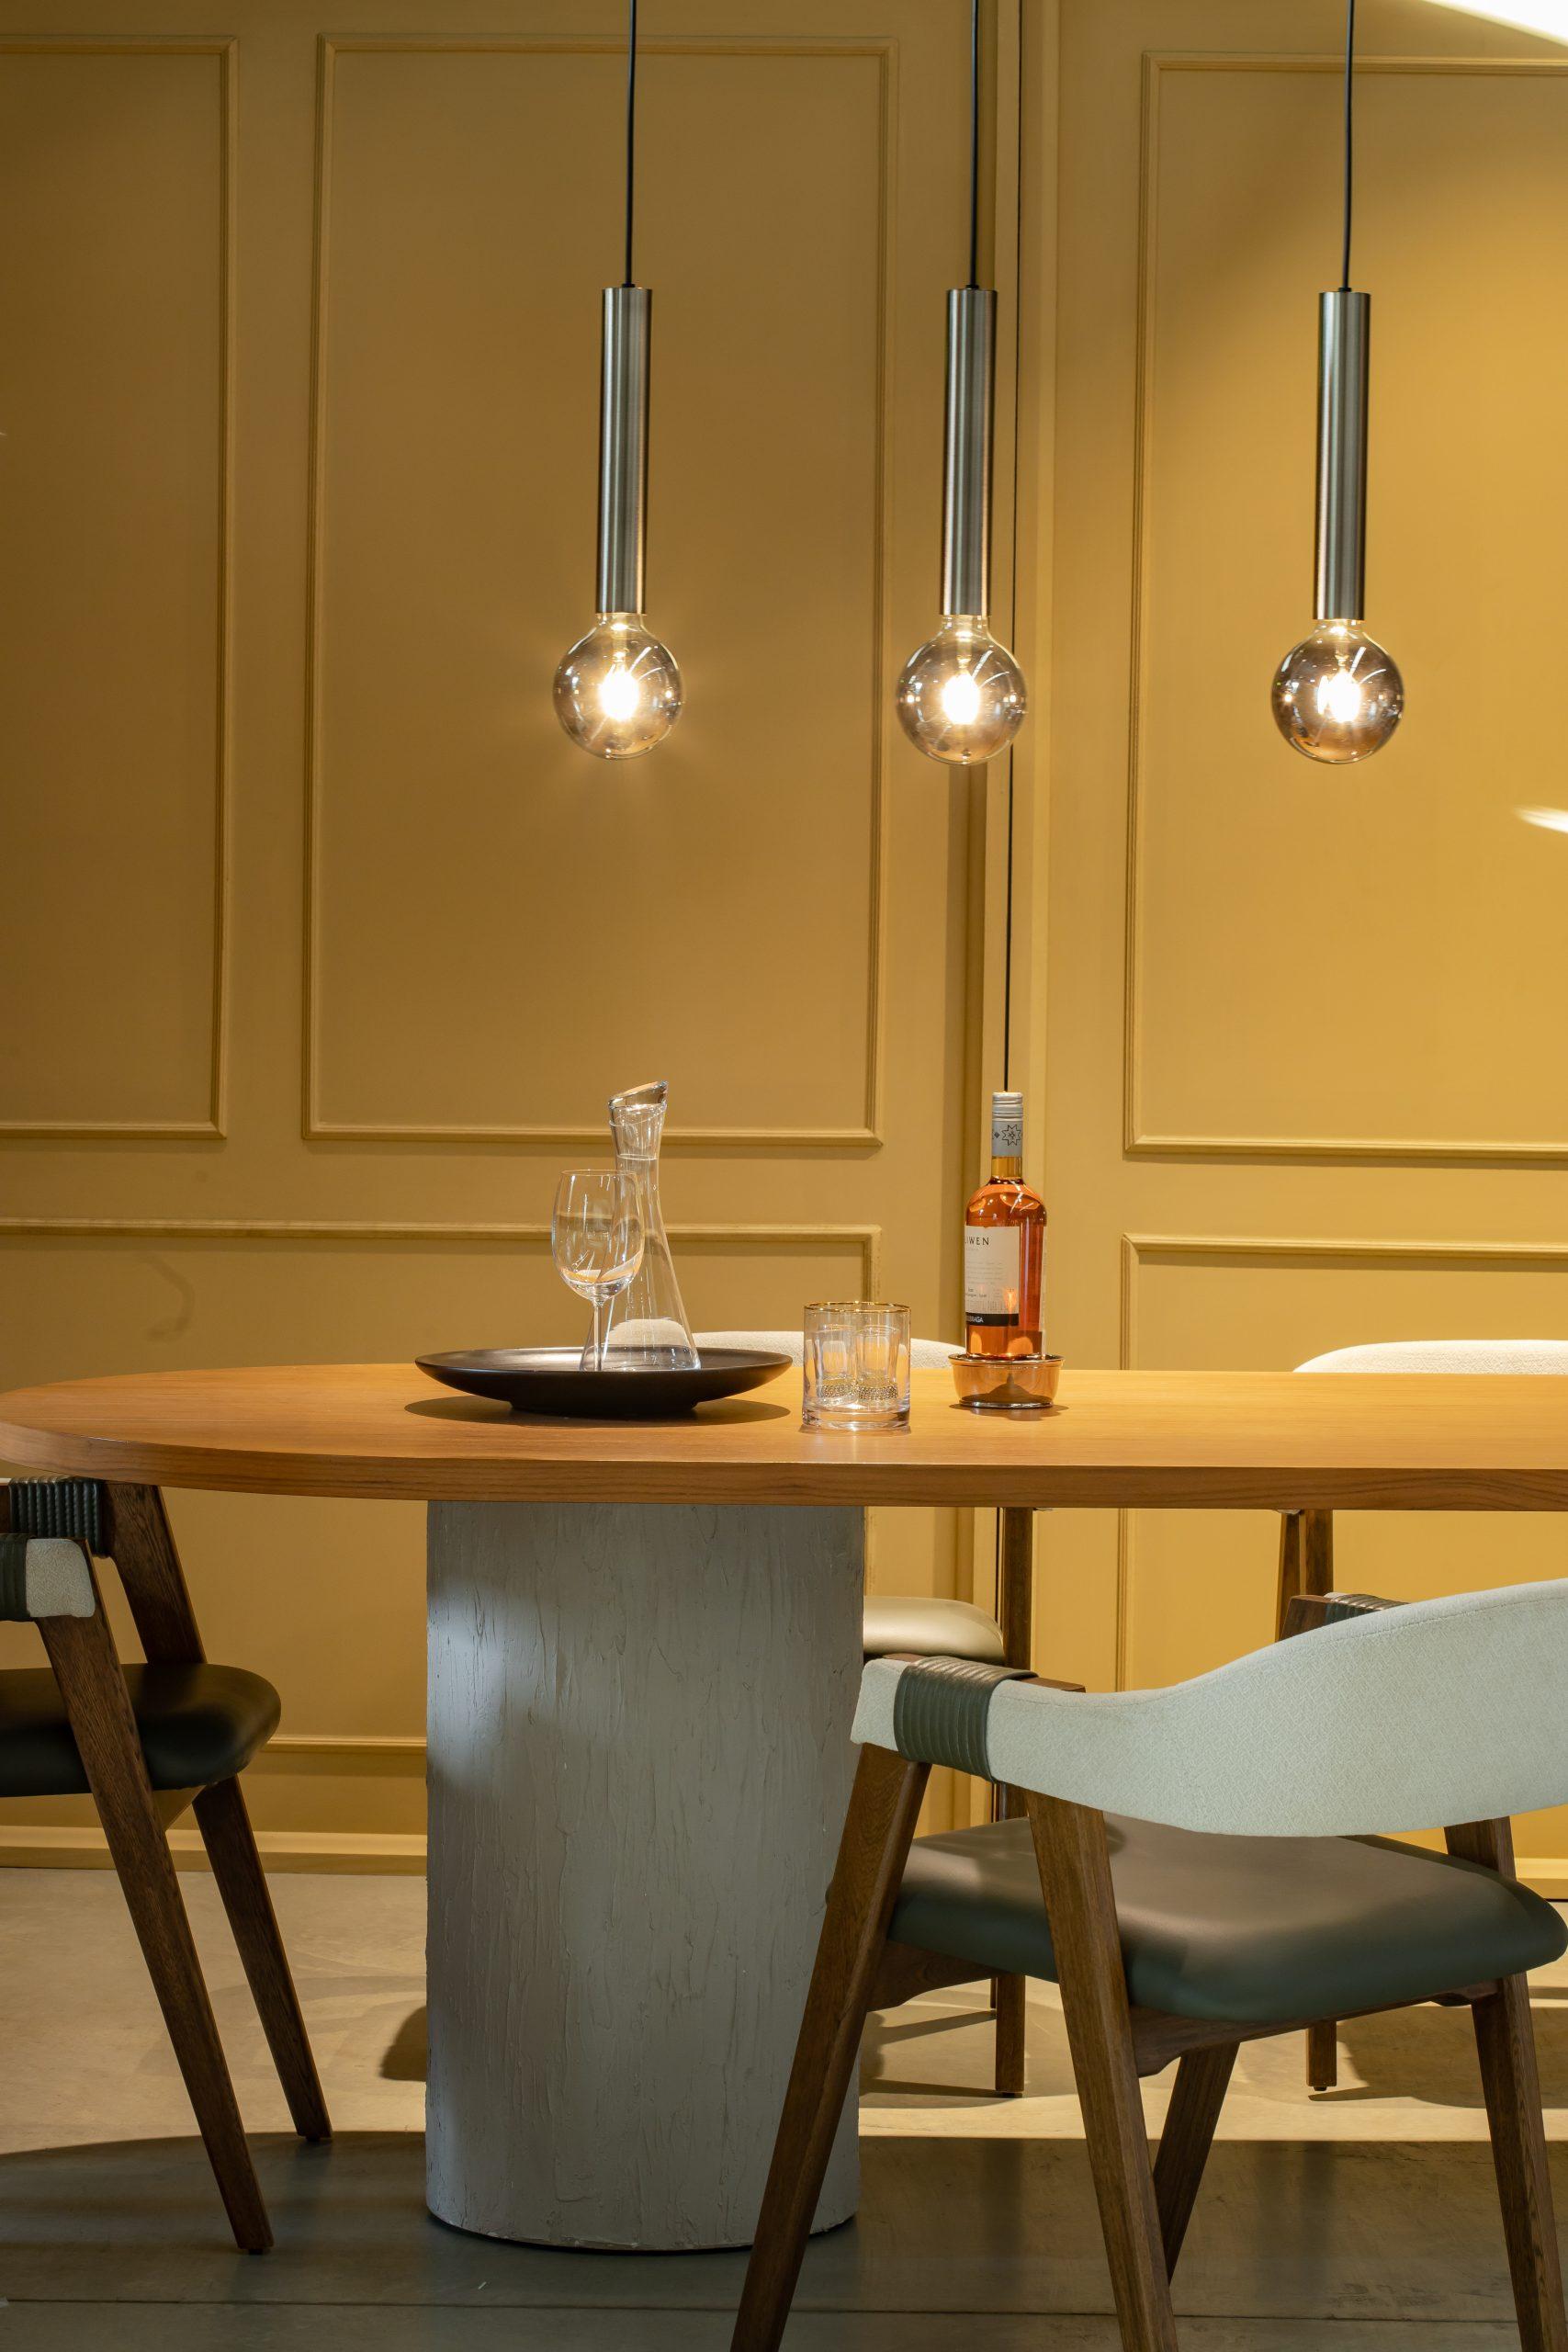 Lámpara colgante tipo riel, ideal para descolgar en barras de cocina, comedores o salas.